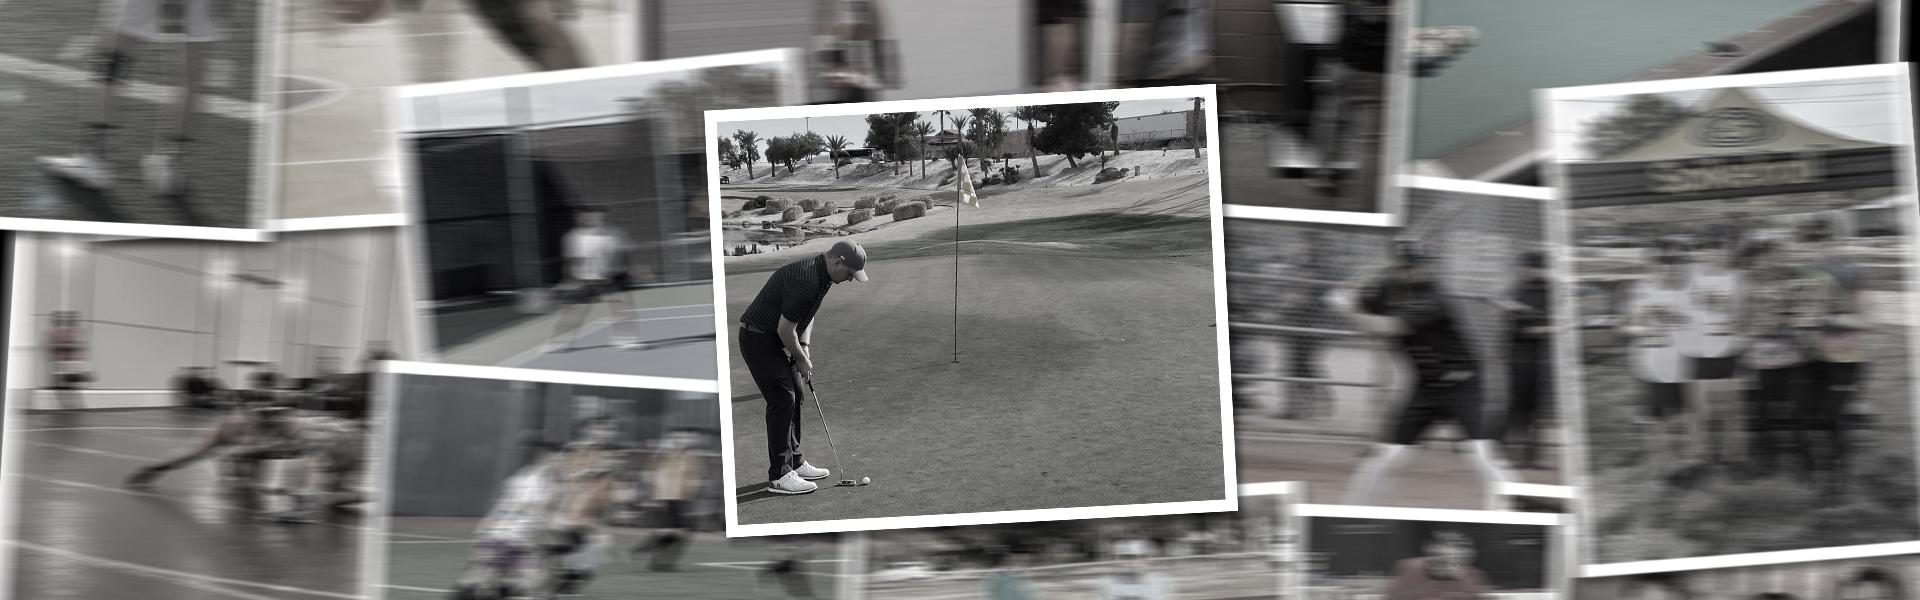 Golf - 2022